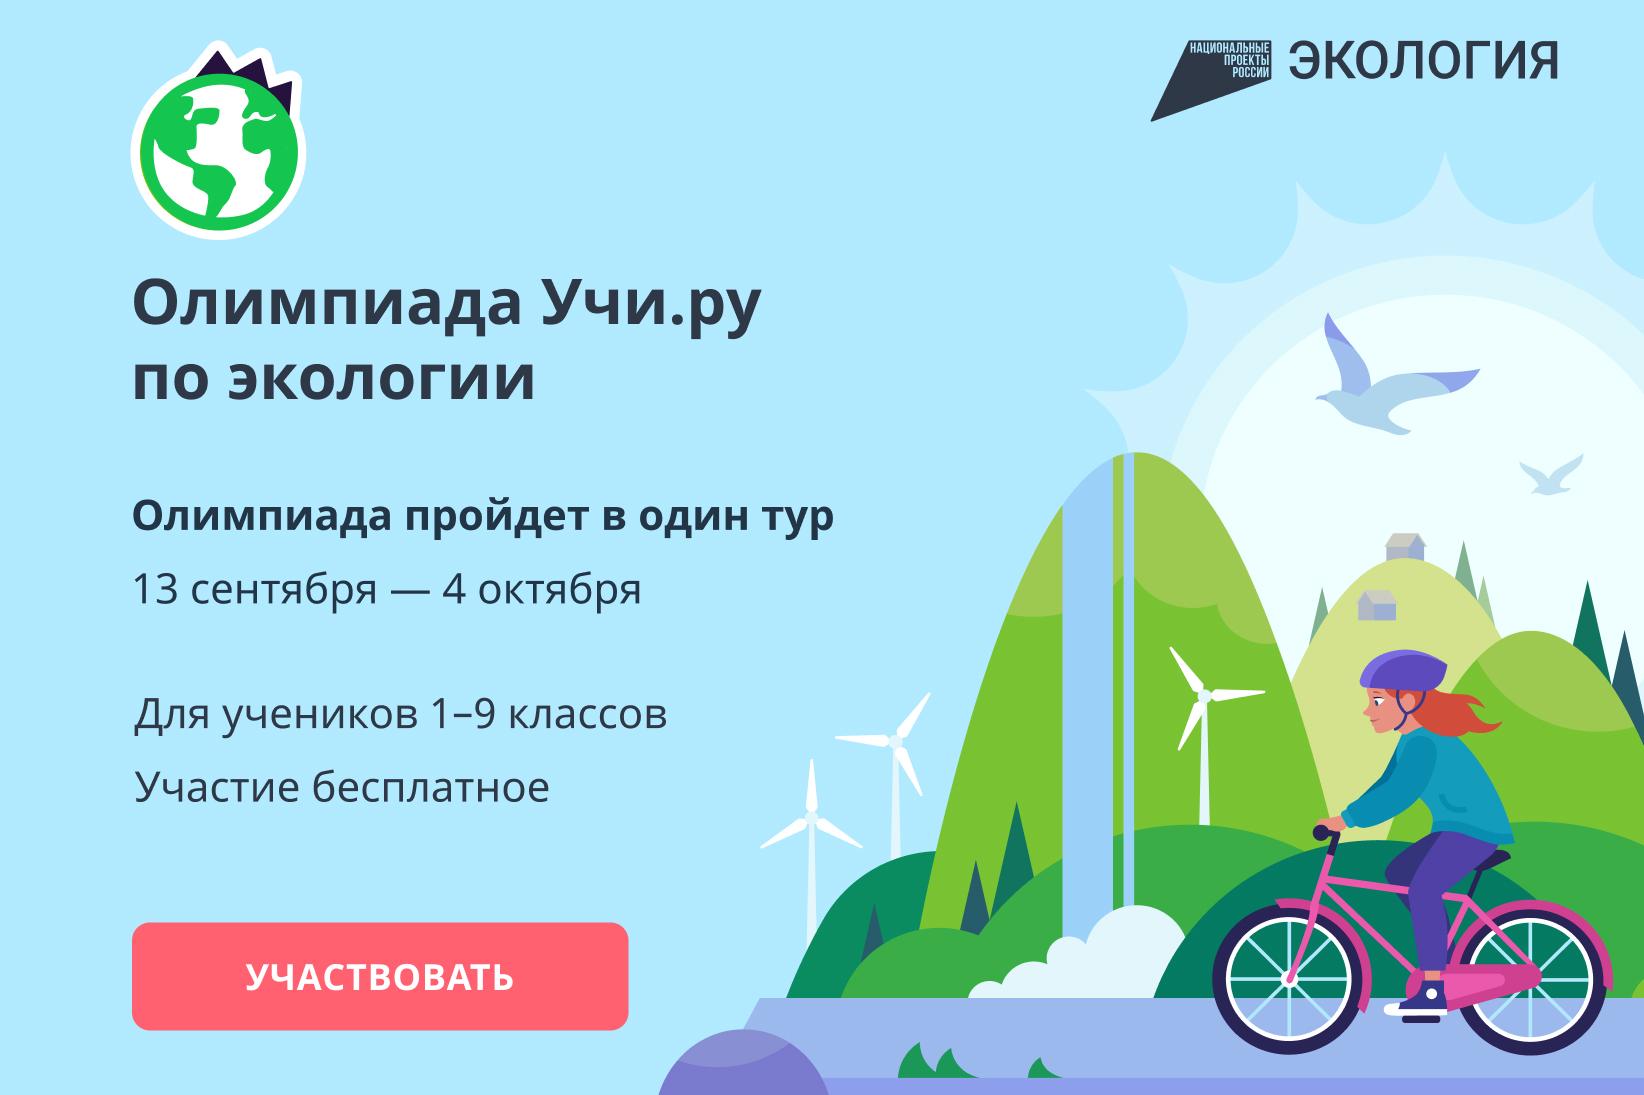 Олимпиада по экологии